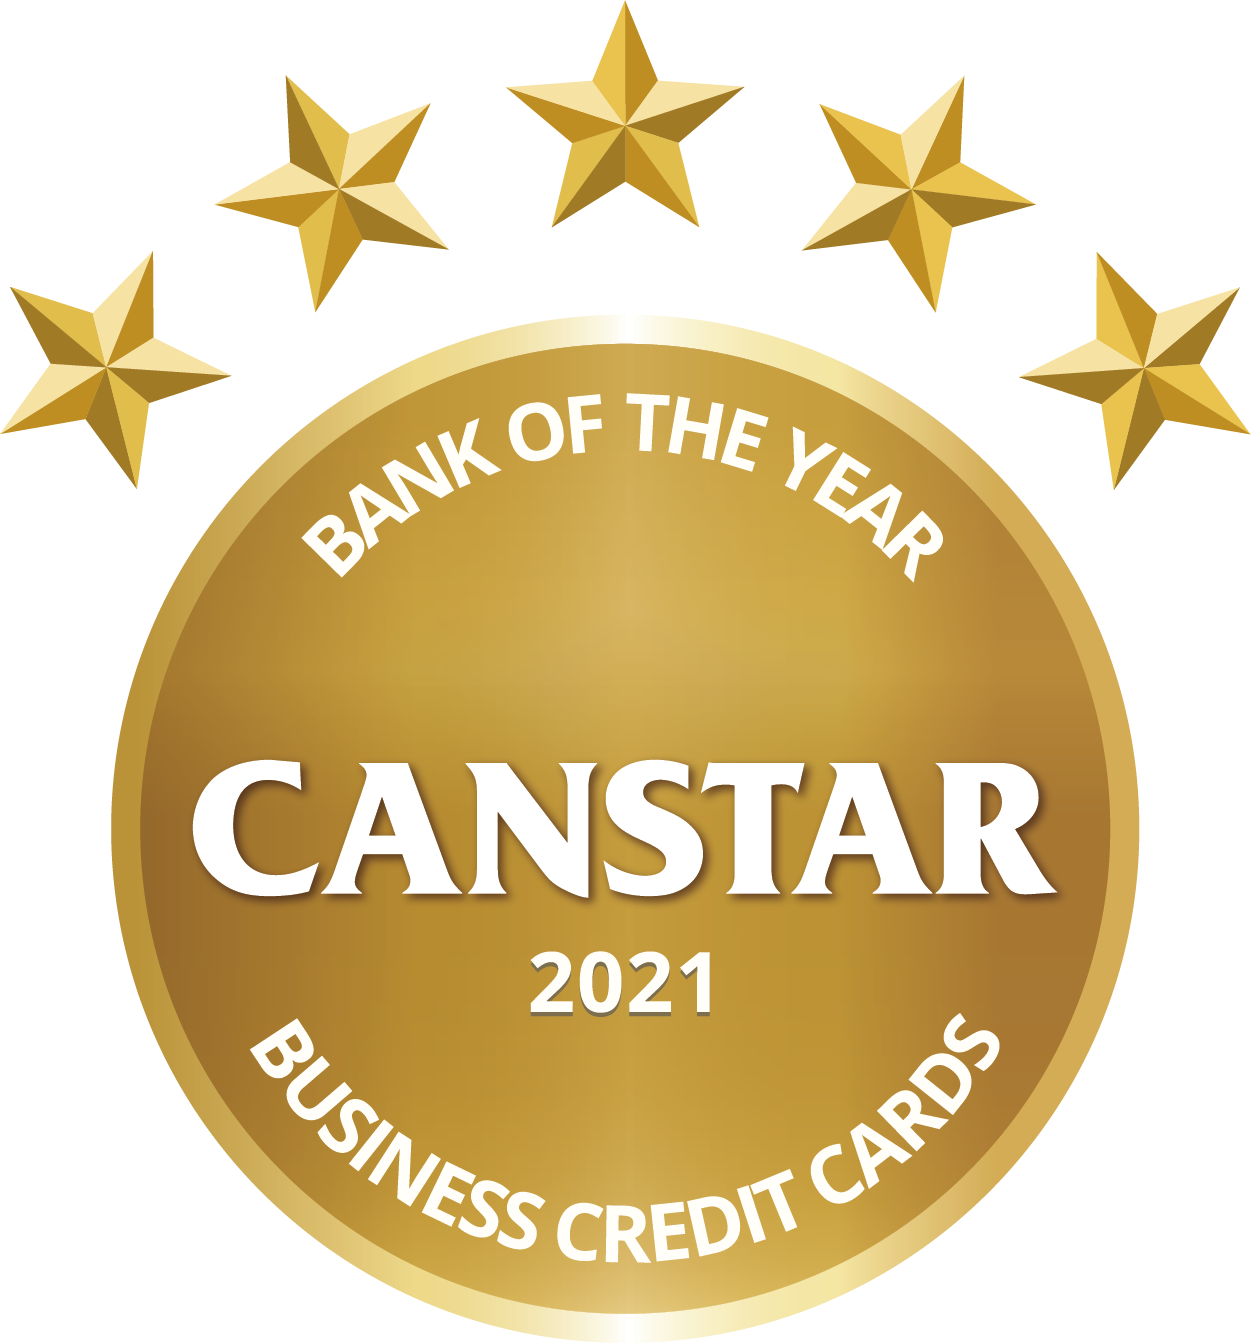 Bank of the year business credit card award logo